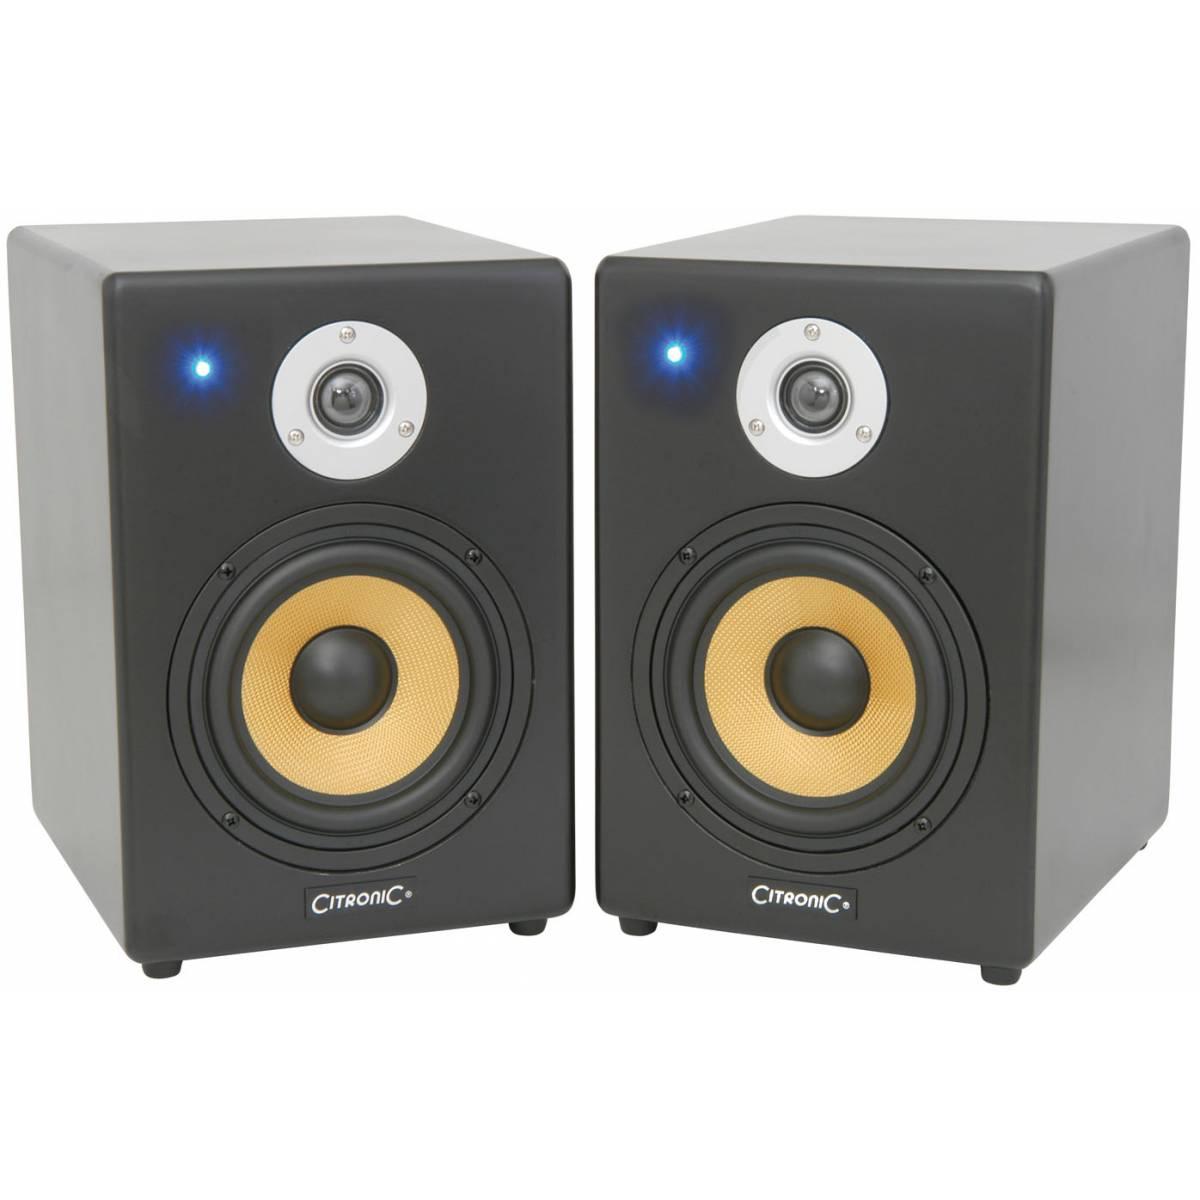 citronic st6 mkii active studio monitors pair studio monitor speakers from inta audio uk. Black Bedroom Furniture Sets. Home Design Ideas